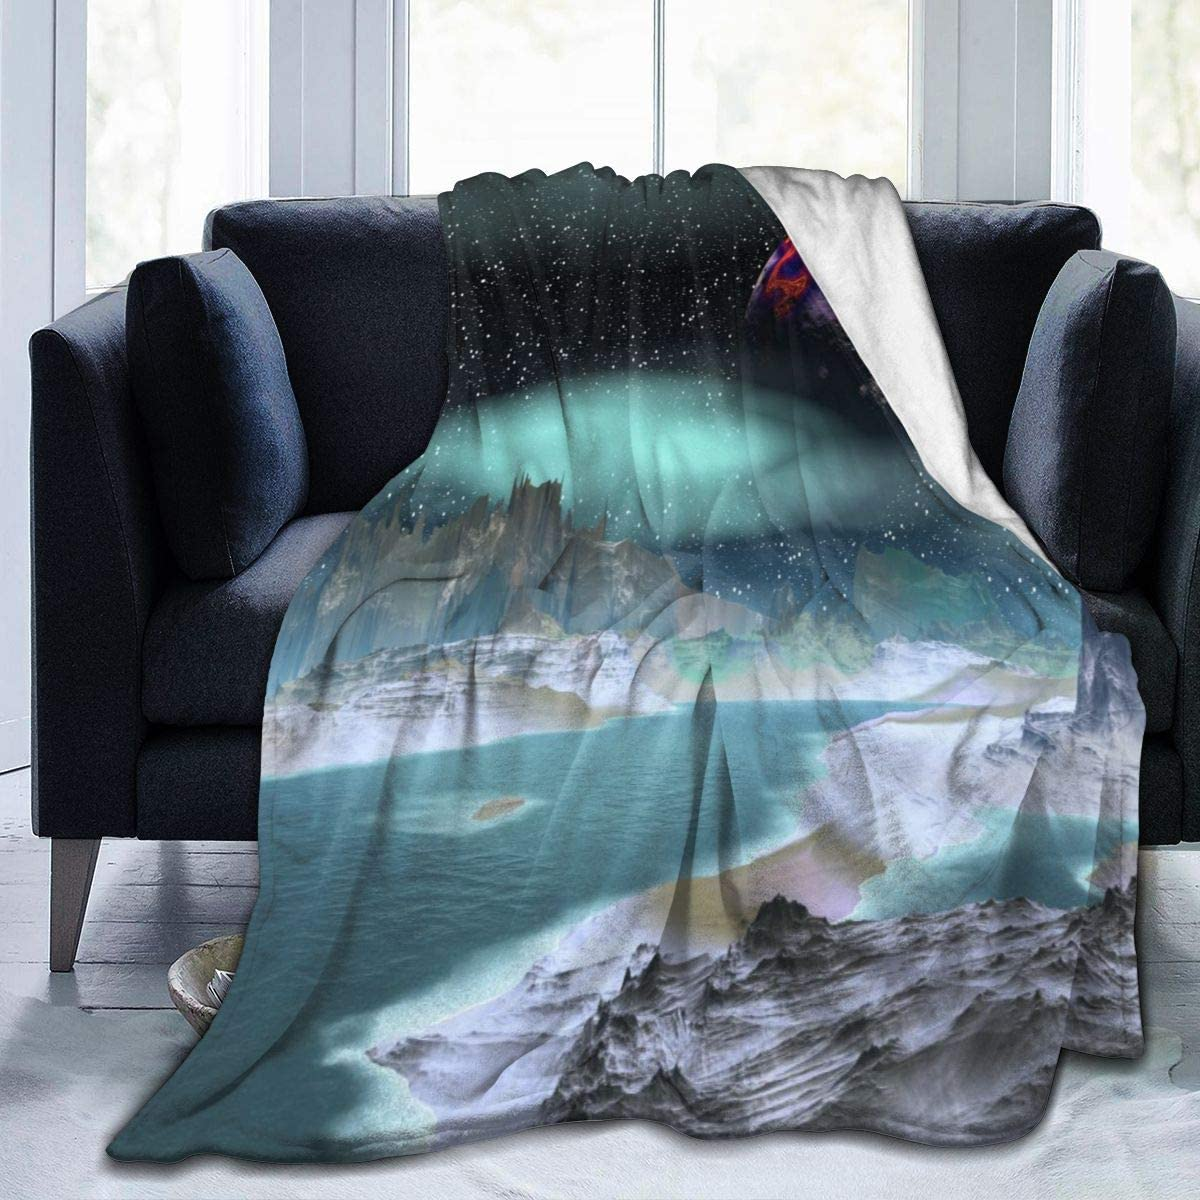 Micro Fleece Plush Soft Baby Blanket Starry Sky Lake Mirage Fluffy Warm Toddler Bed/Crib Blanket Lightweight Flannel Daycare Nap Kids Sleeping Tummy Time Throw Blanket Girls Boy Clearance Kid/Baby